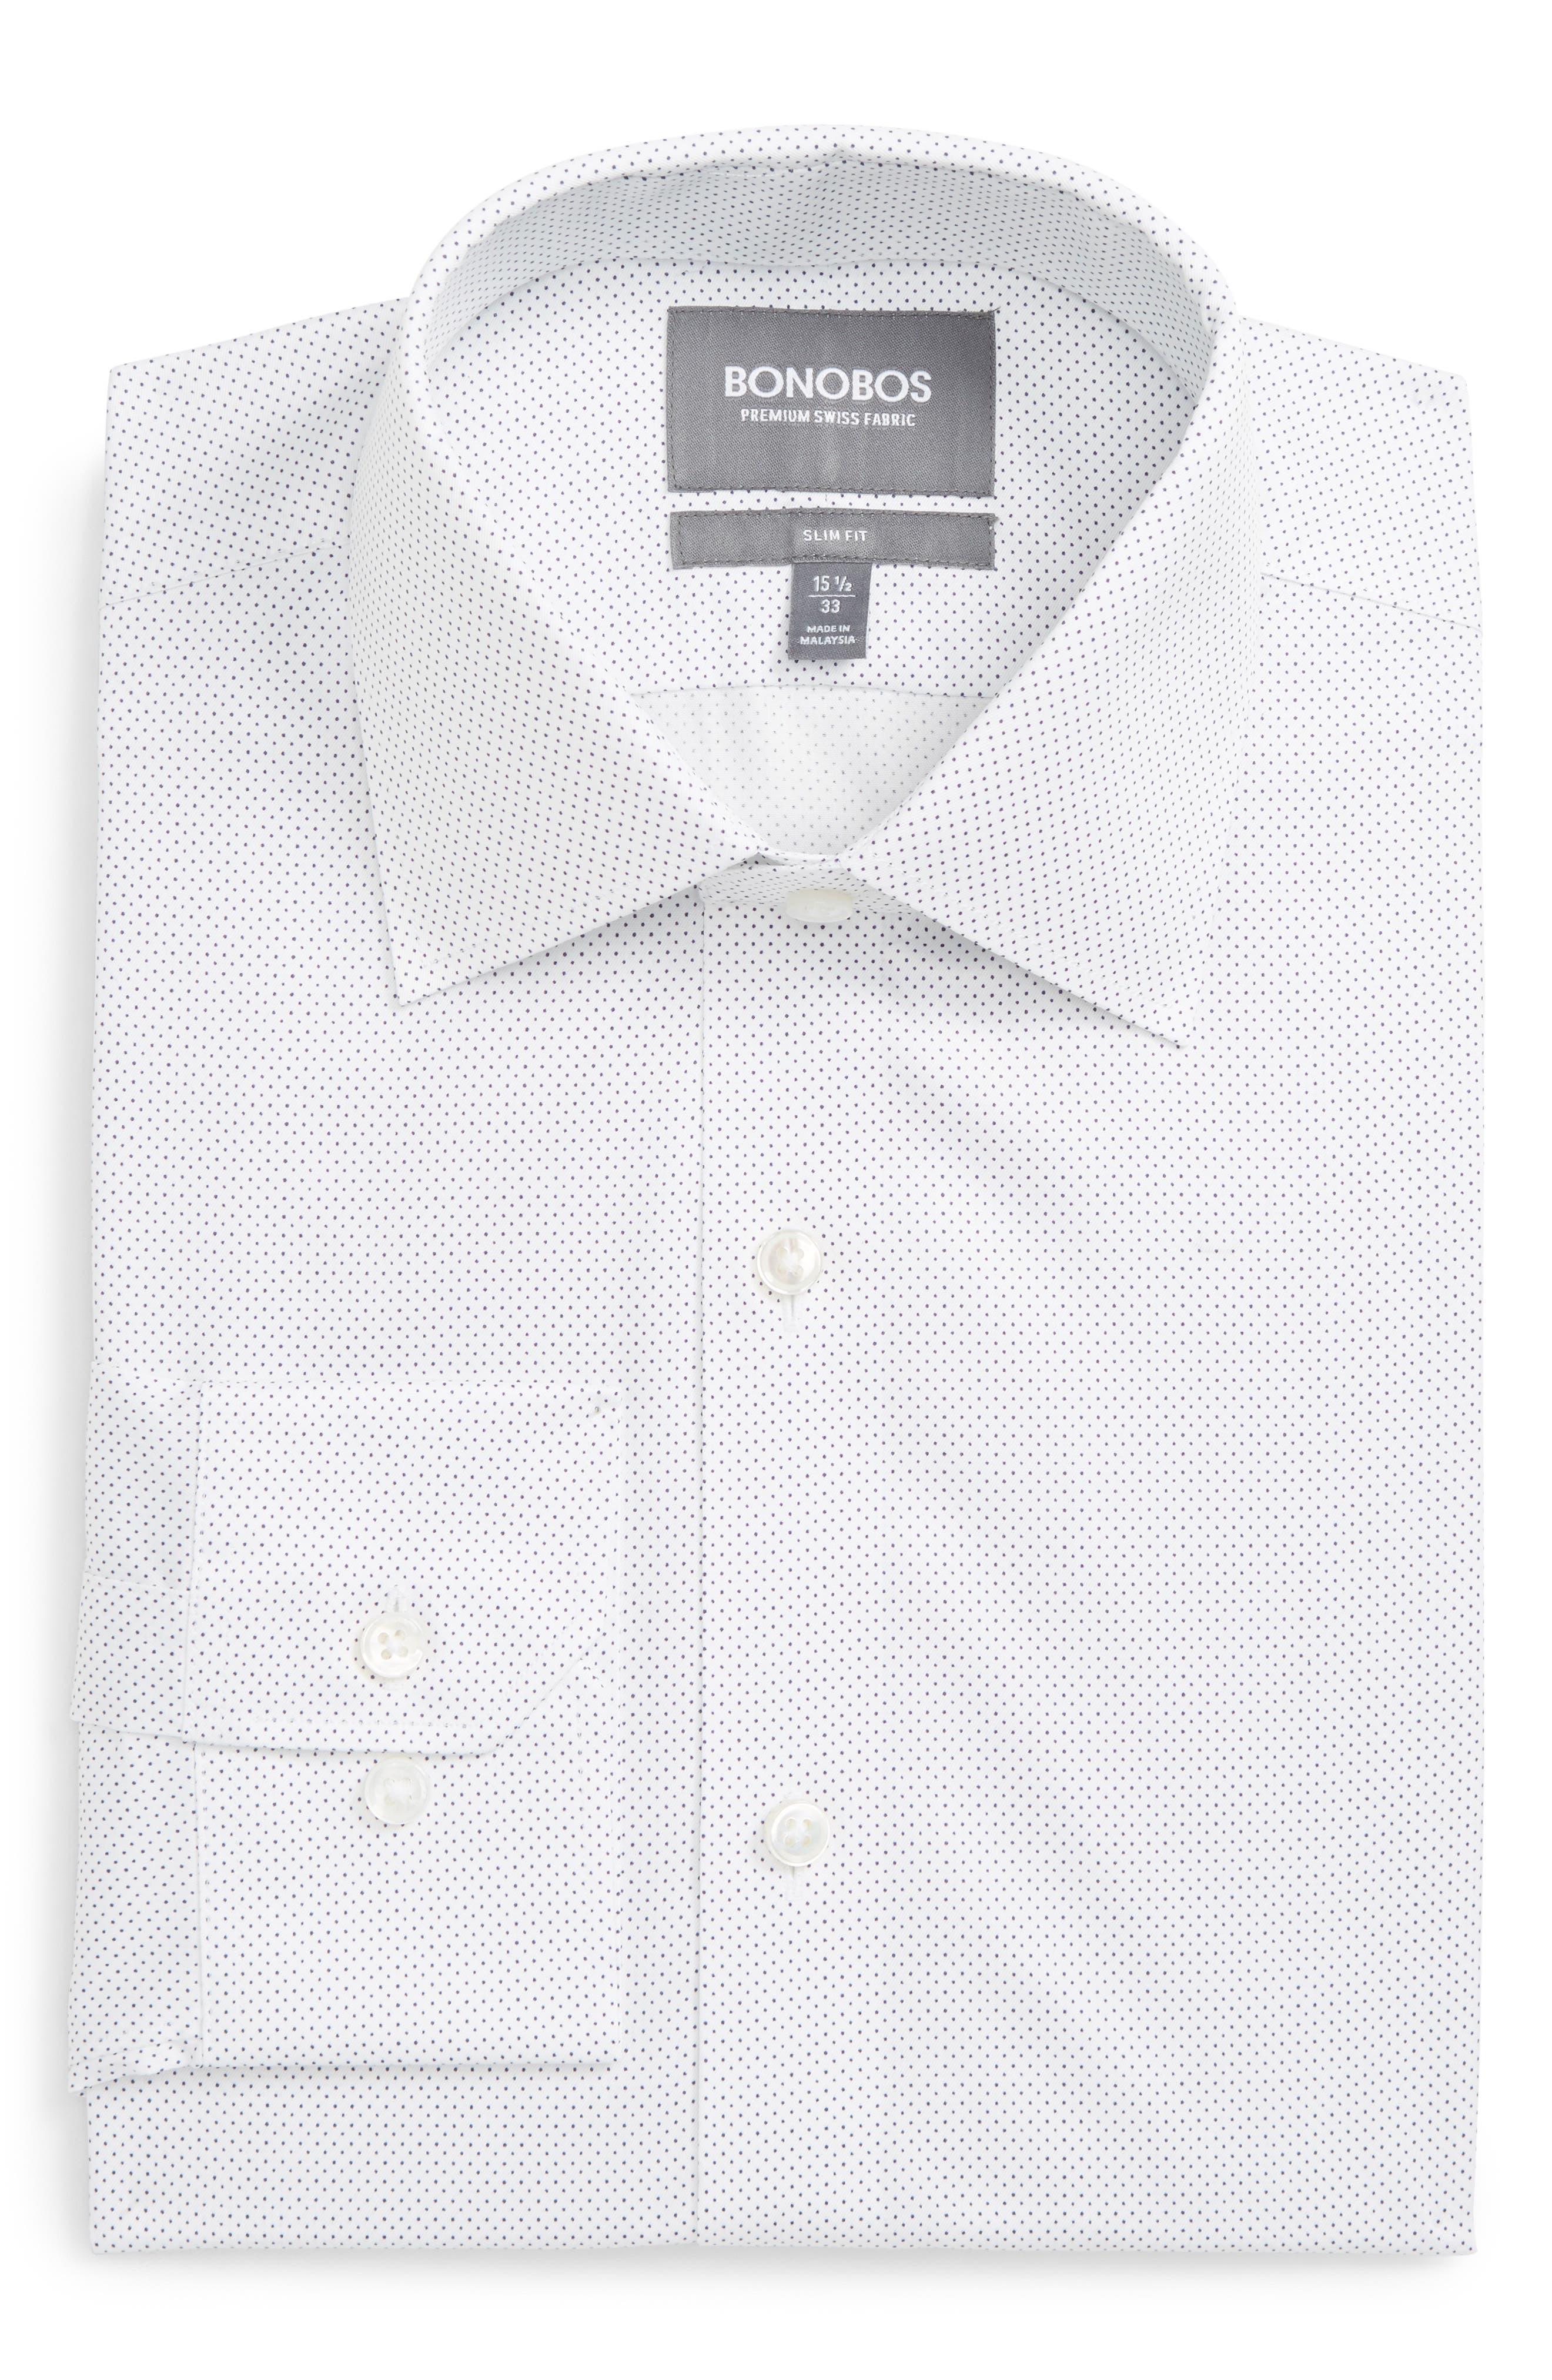 BONOBOS Zino Trim Fit Dot Dress Shirt, Main, color, 400